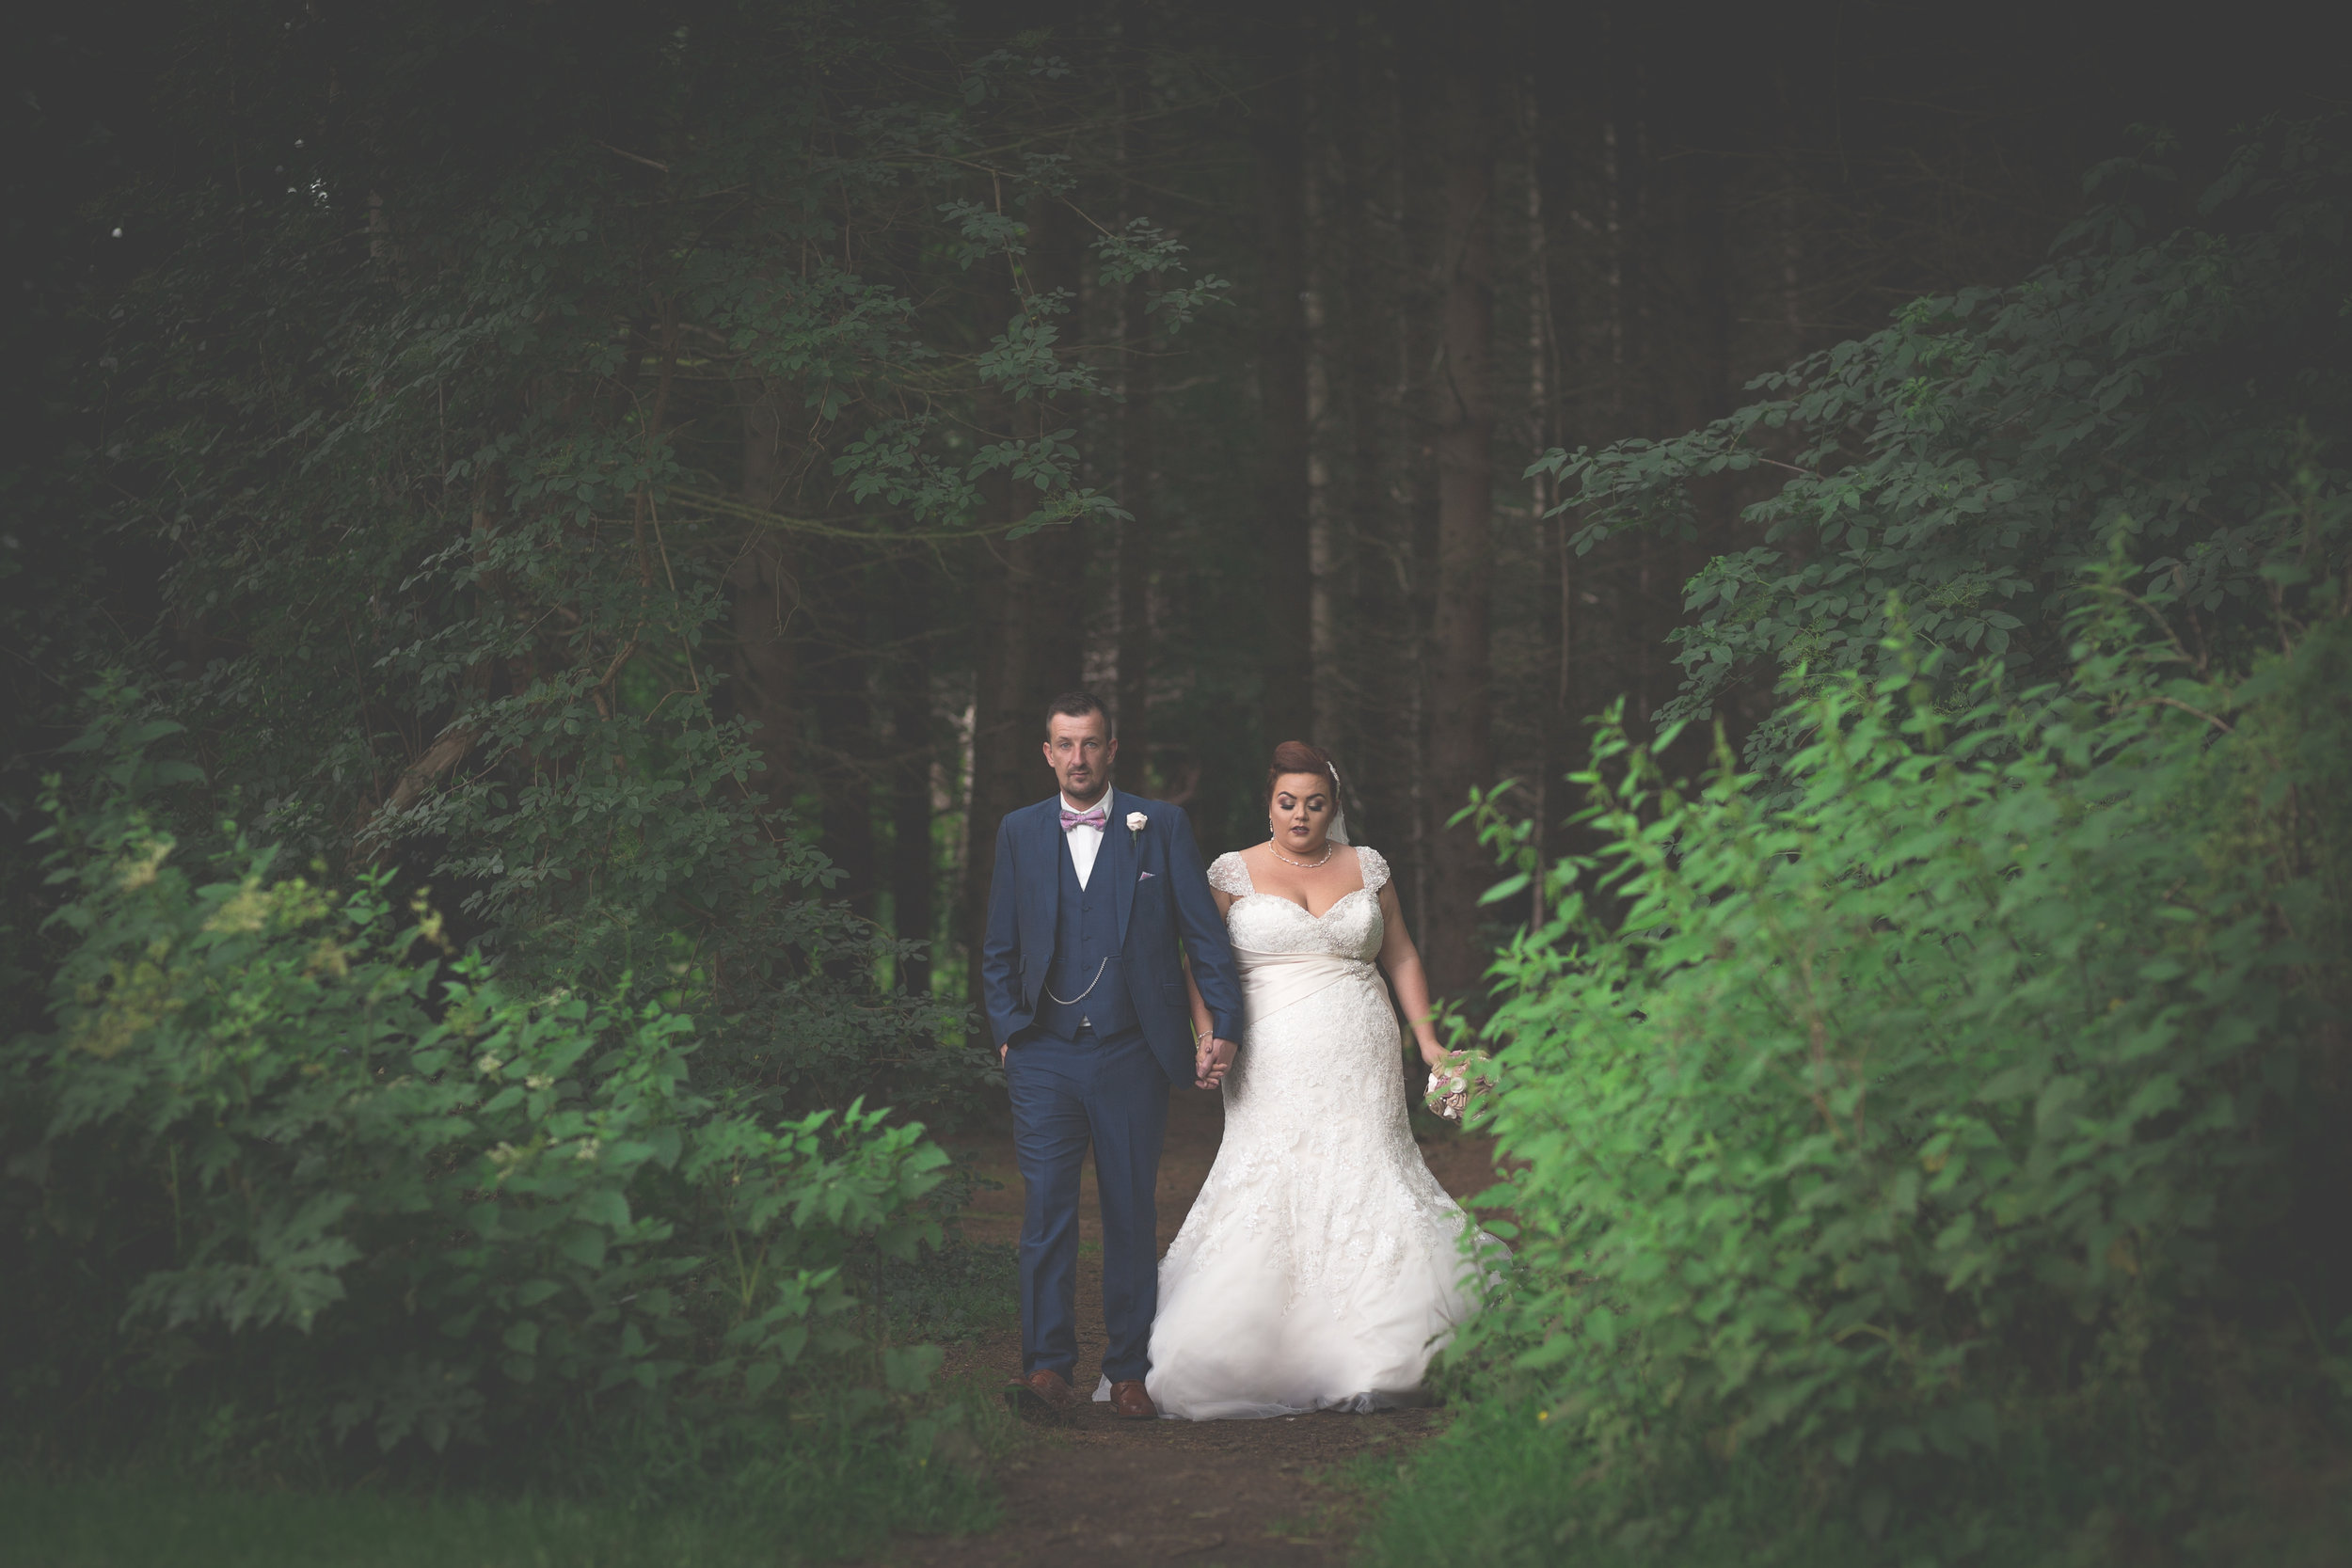 Antoinette & Stephen - Portraits   Brian McEwan Photography   Wedding Photographer Northern Ireland 28.jpg